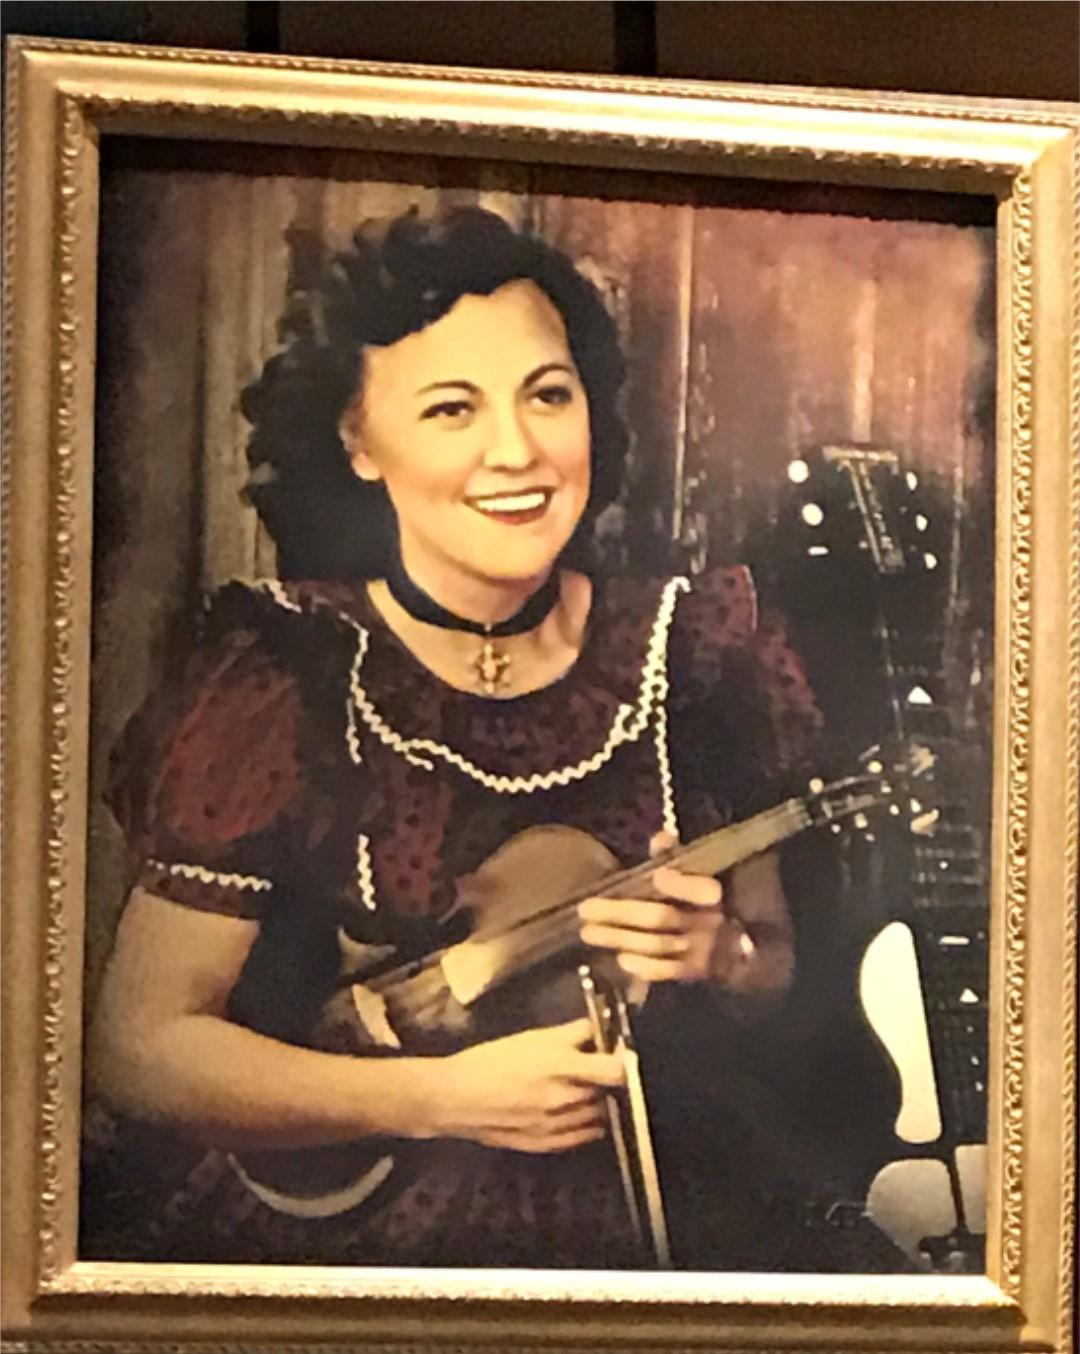 Kentucky music legend Linda Lou Martin passes away